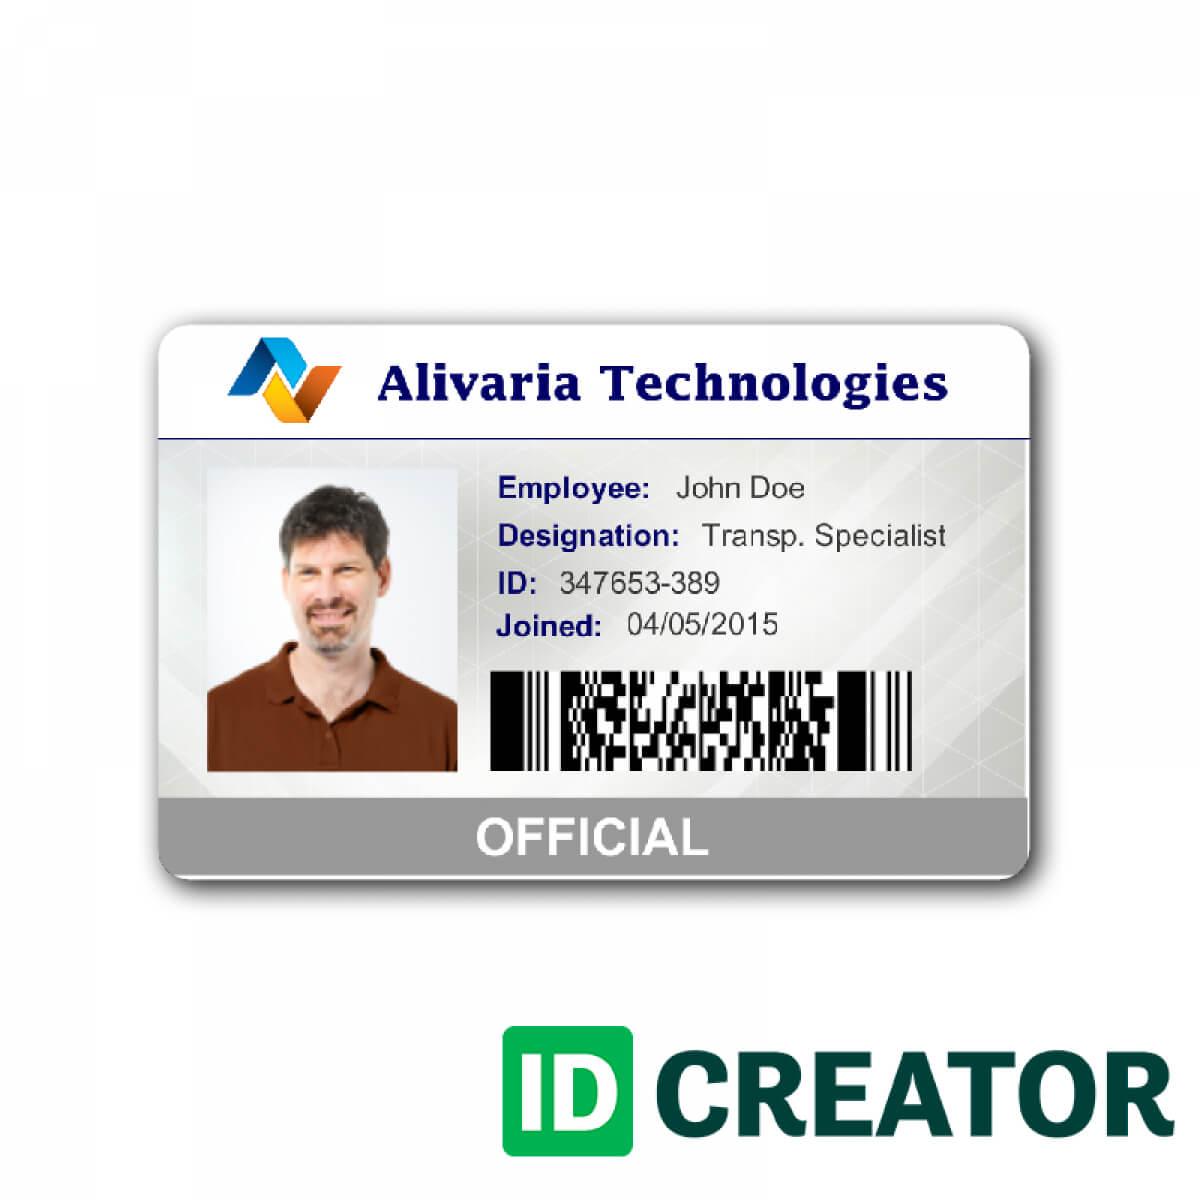 039 Adding Employee Id Card Template Microsoft Word Free Throughout Id Card Template For Microsoft Word